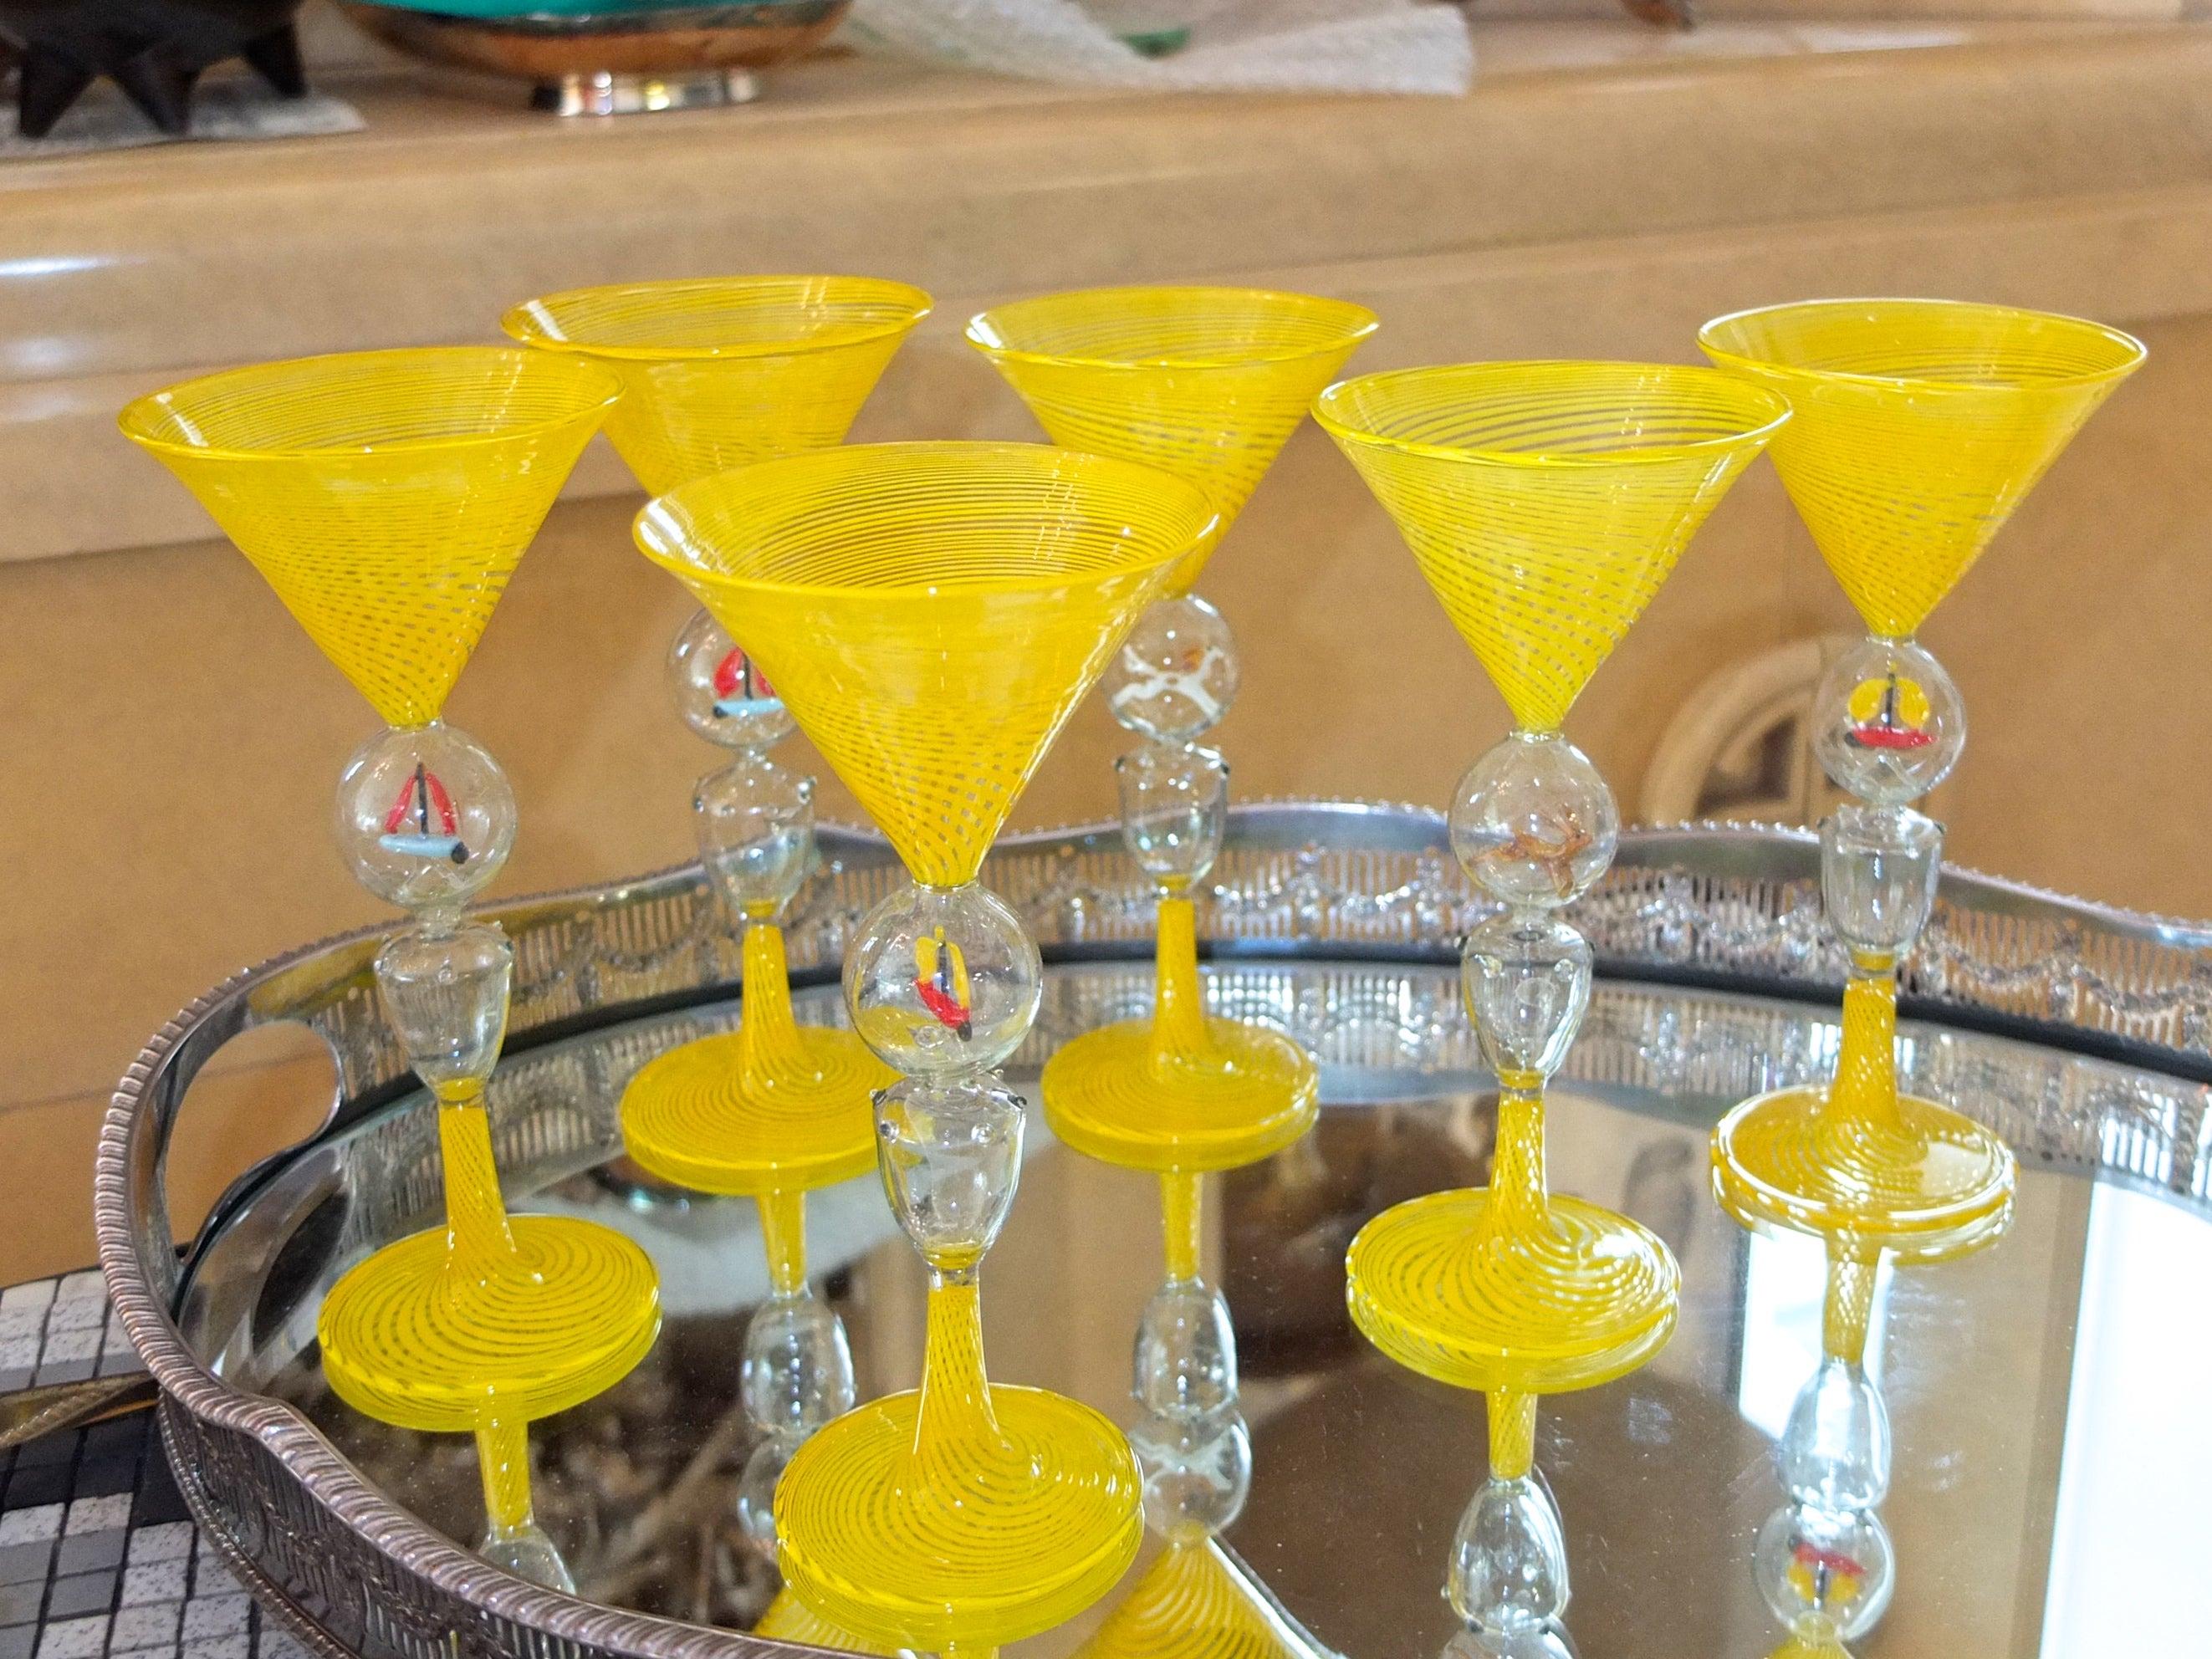 Bimini Werkstatte Martini Glasses, Vienna, 1930s For Sale at 1stdibs